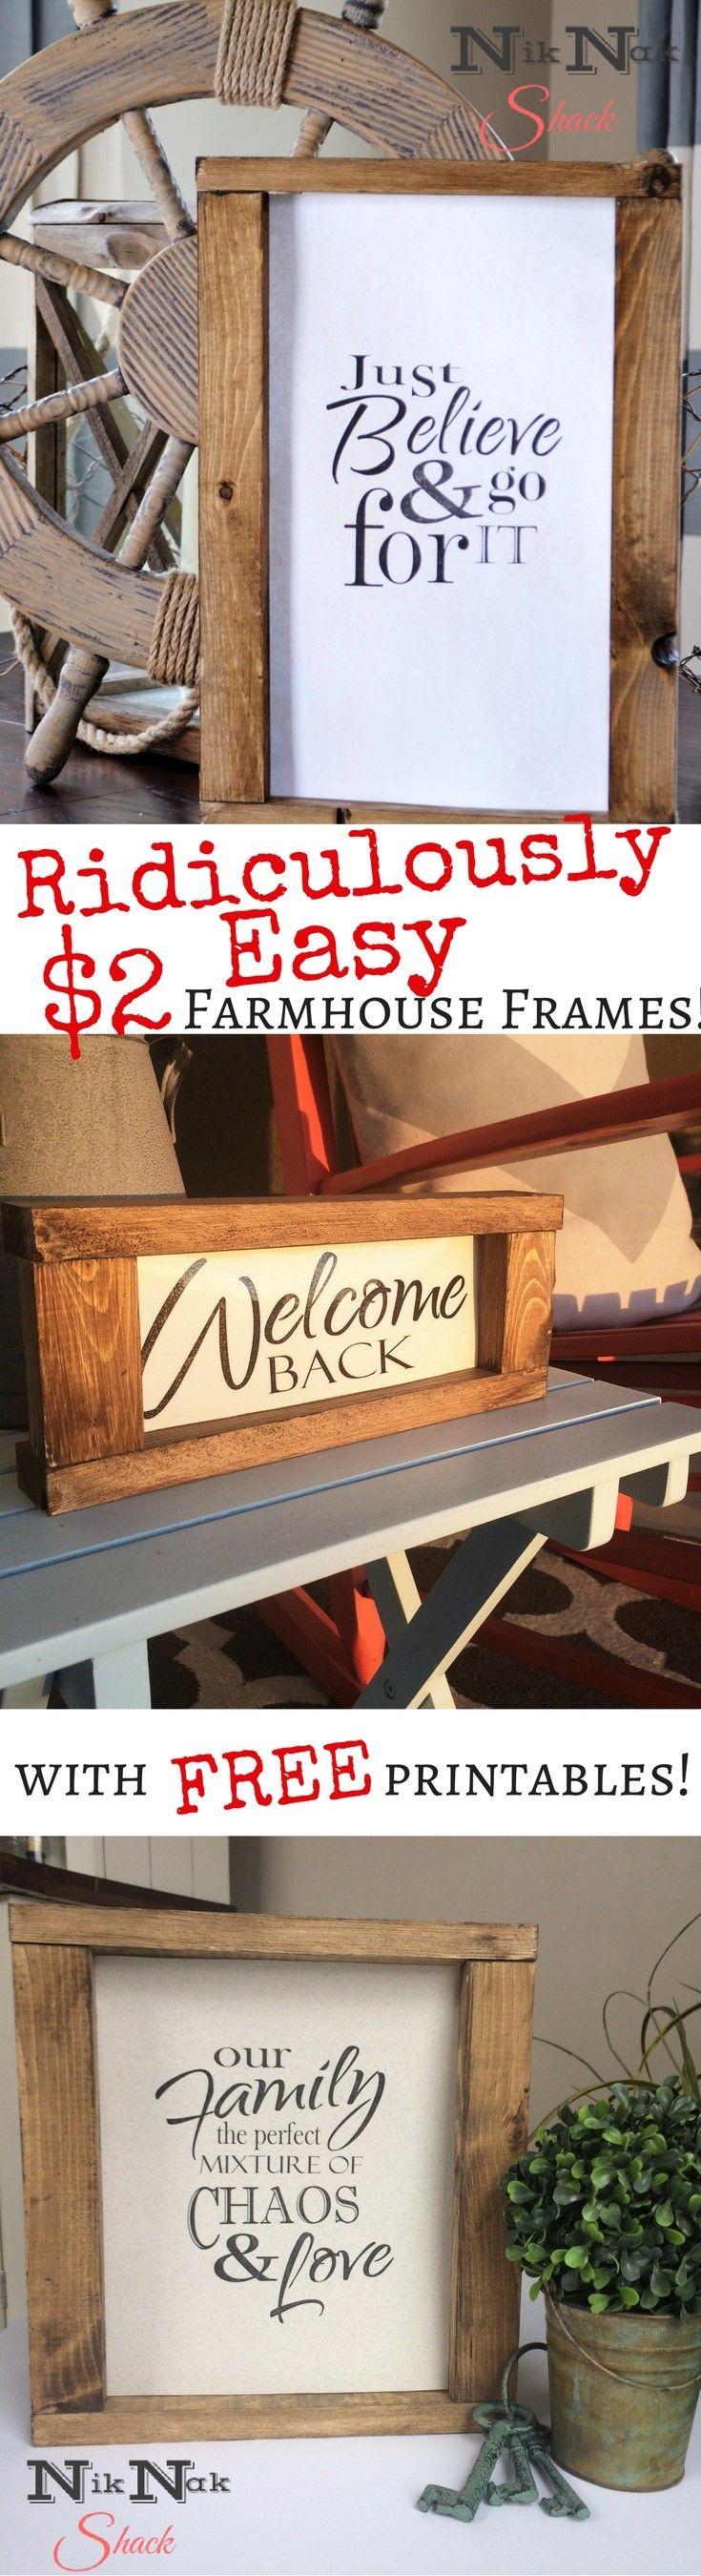 DIY Home Decor! Super easy farmhouse frames with free printables! #livingroomdecor #farmhousedecor #diyhomedecor